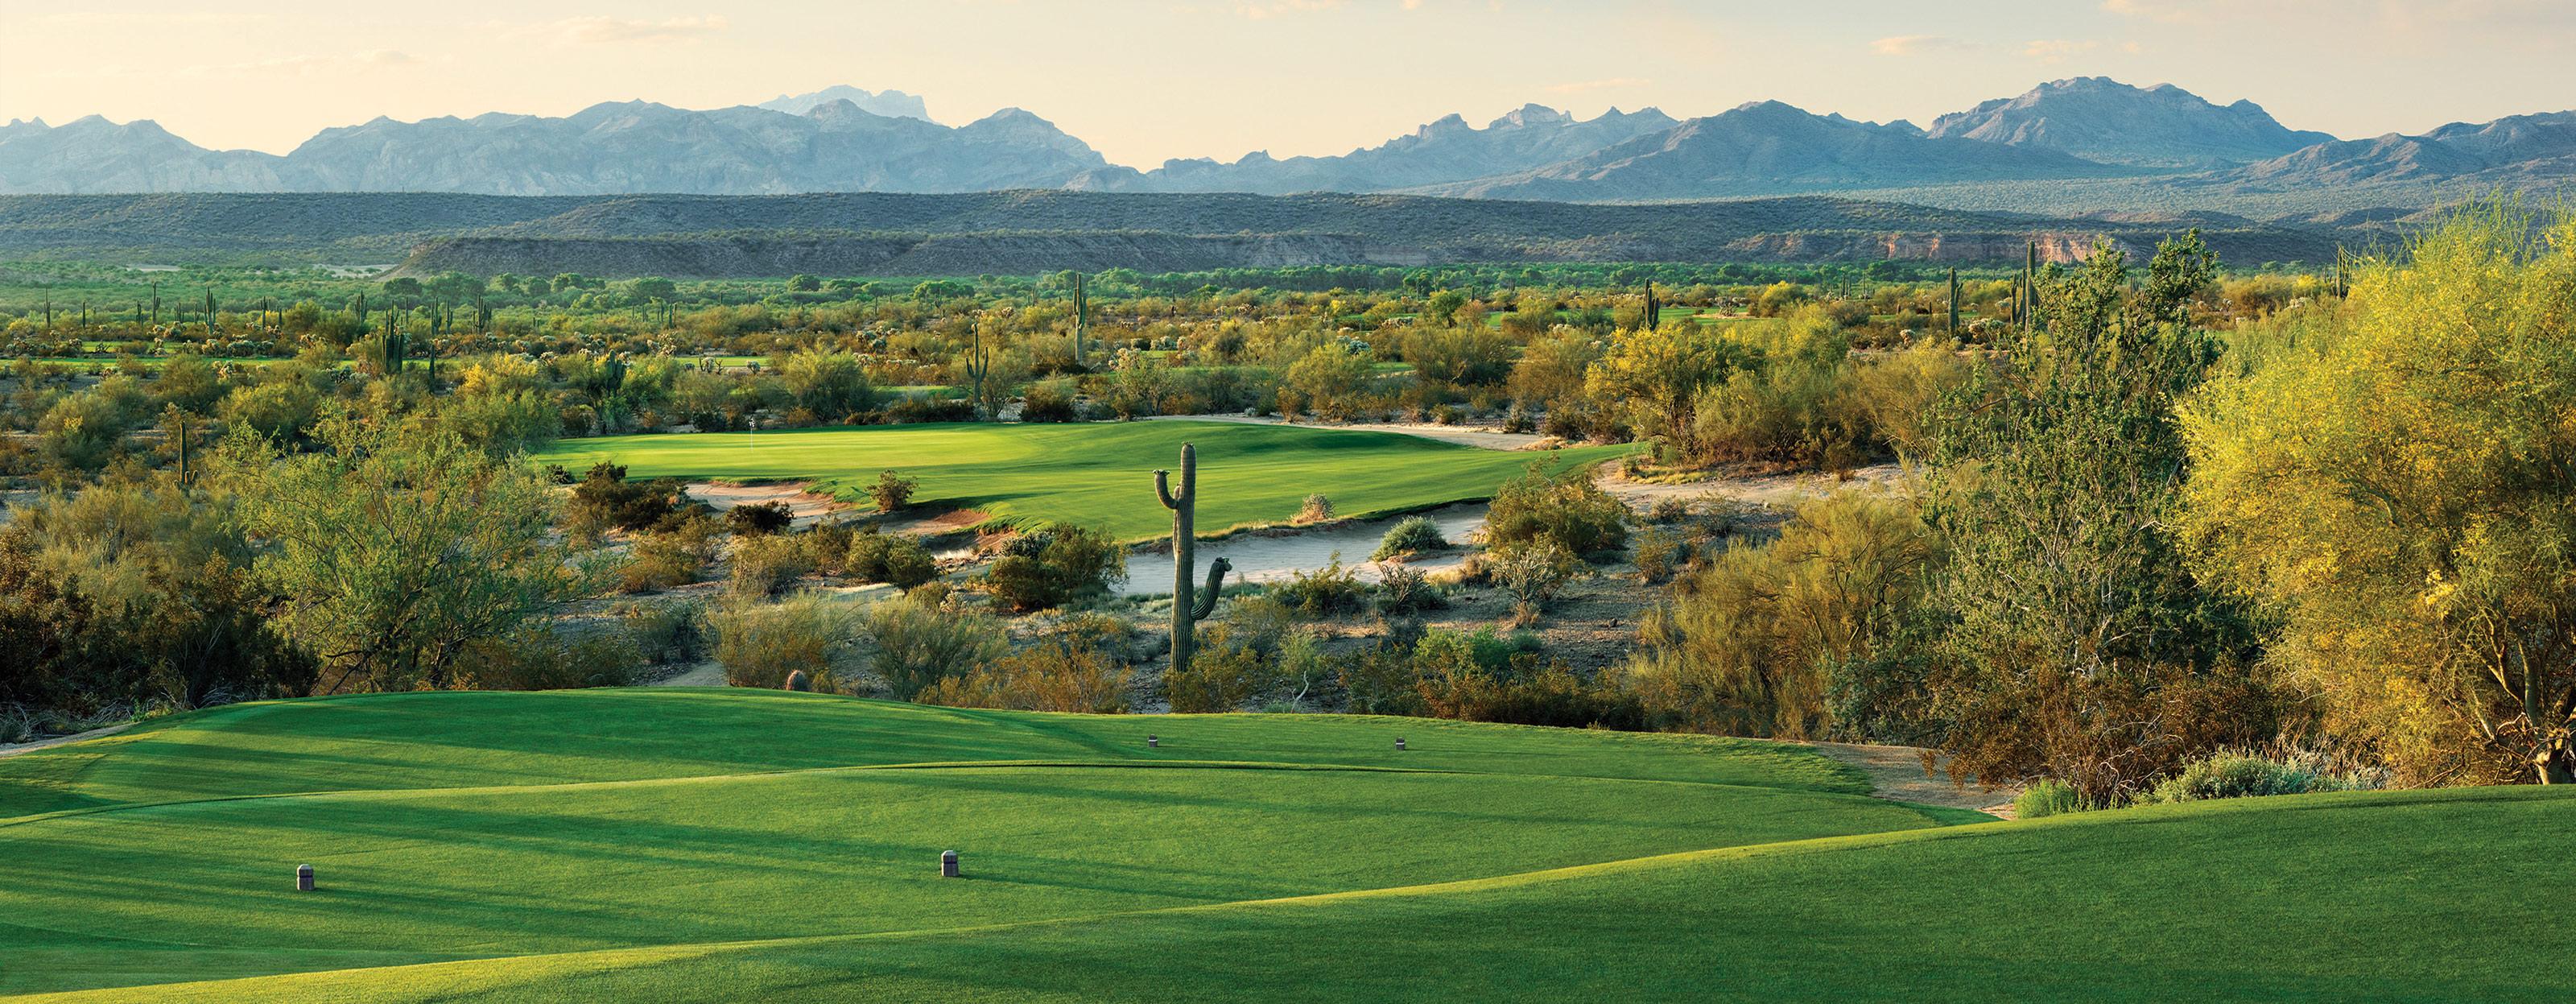 desert days golf in arizona u2022 kingdom magazine